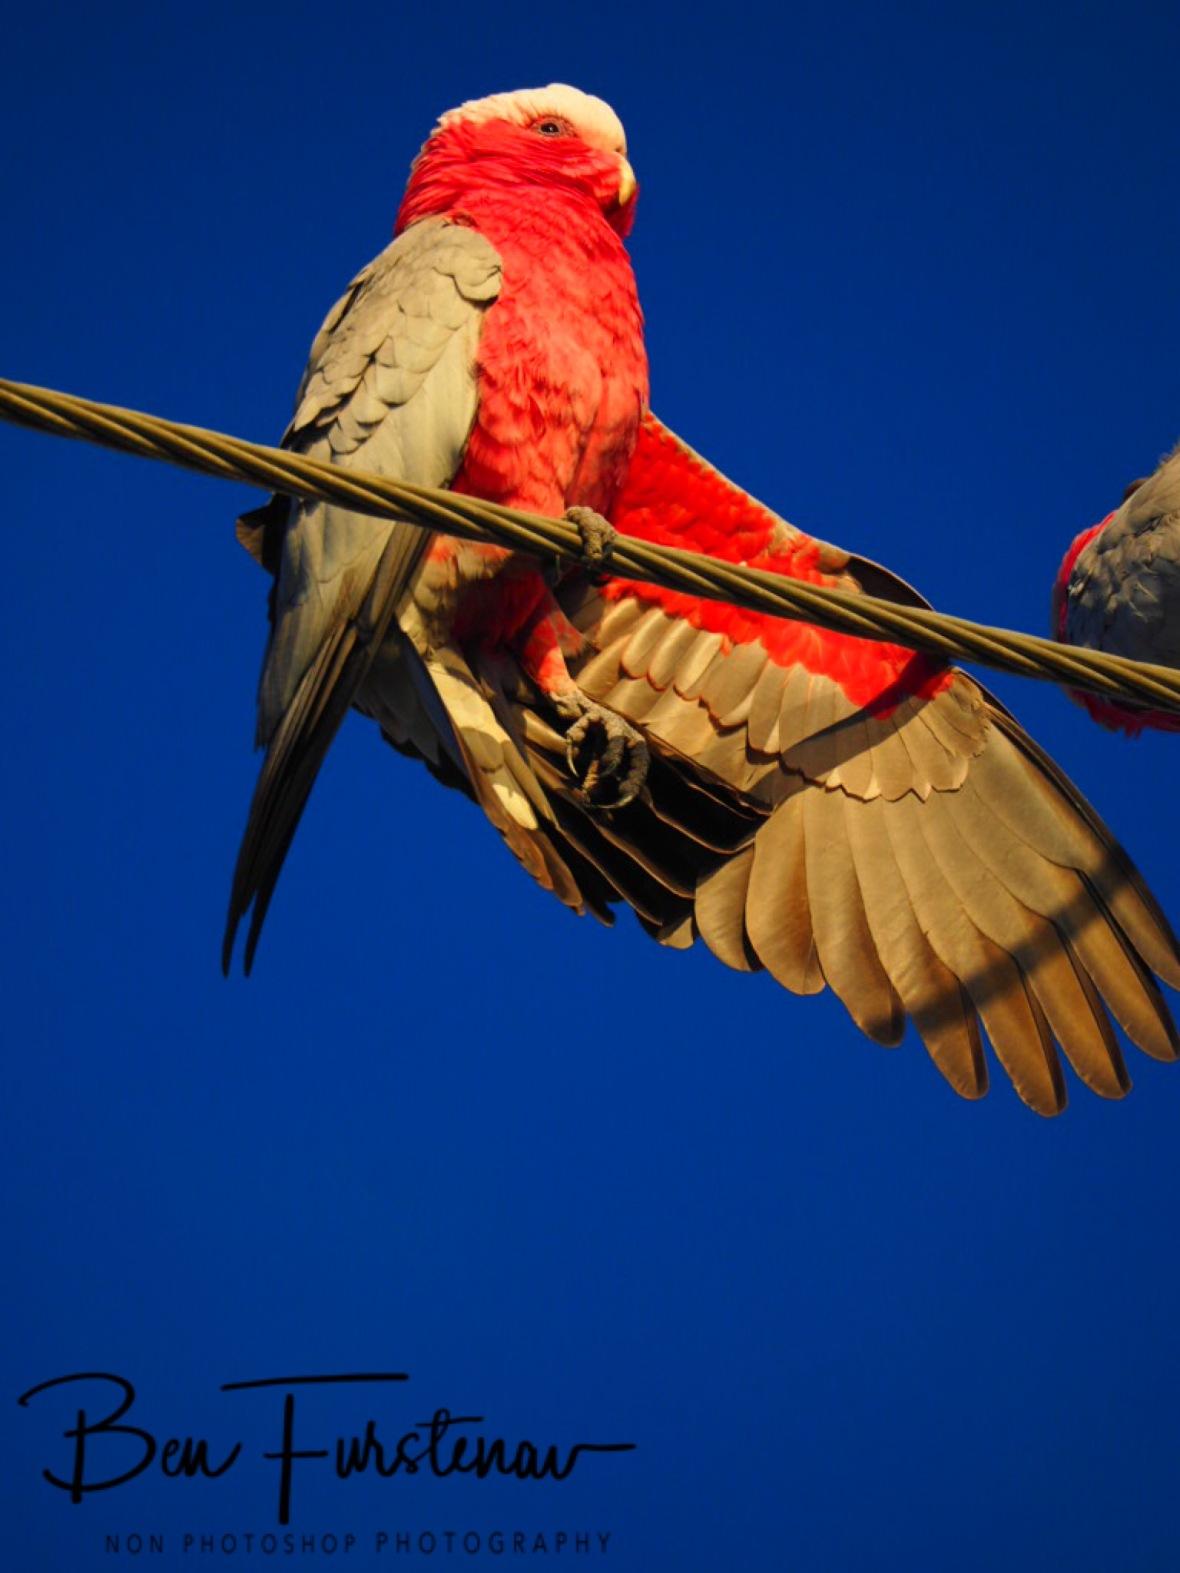 Signal @ Deception Bay, South-east Queensland, Australia